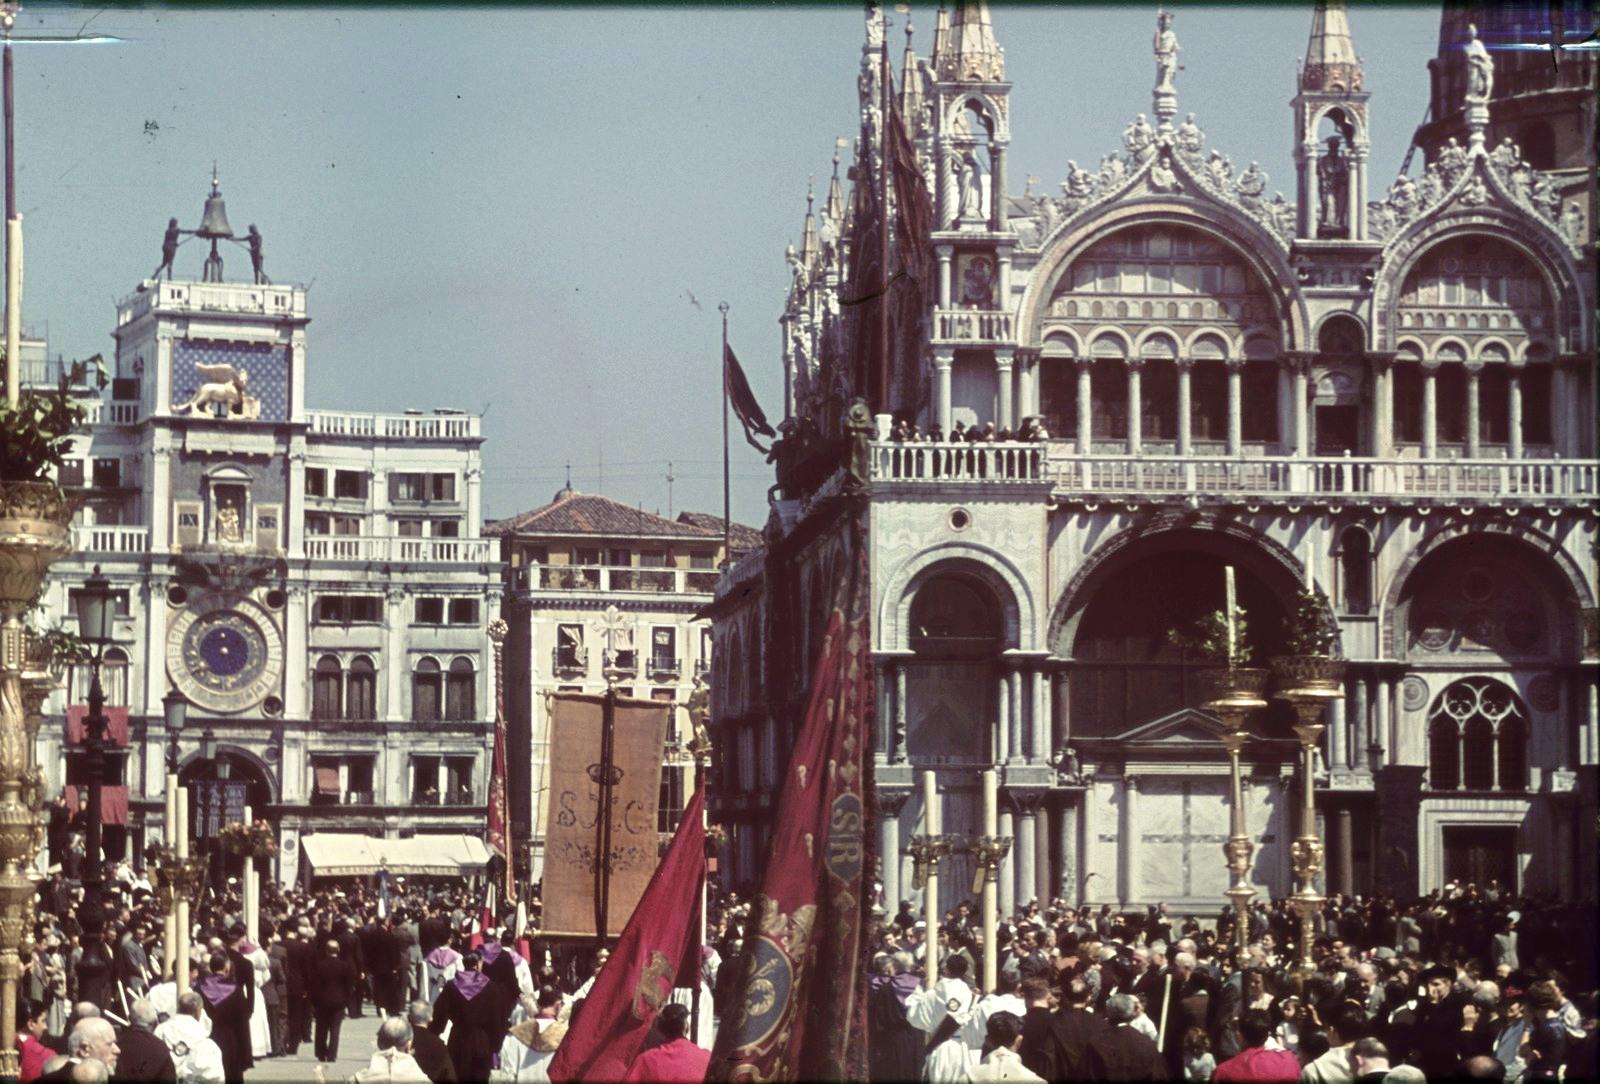 Площадь Святого Марка. Часовая башня Святого Марка